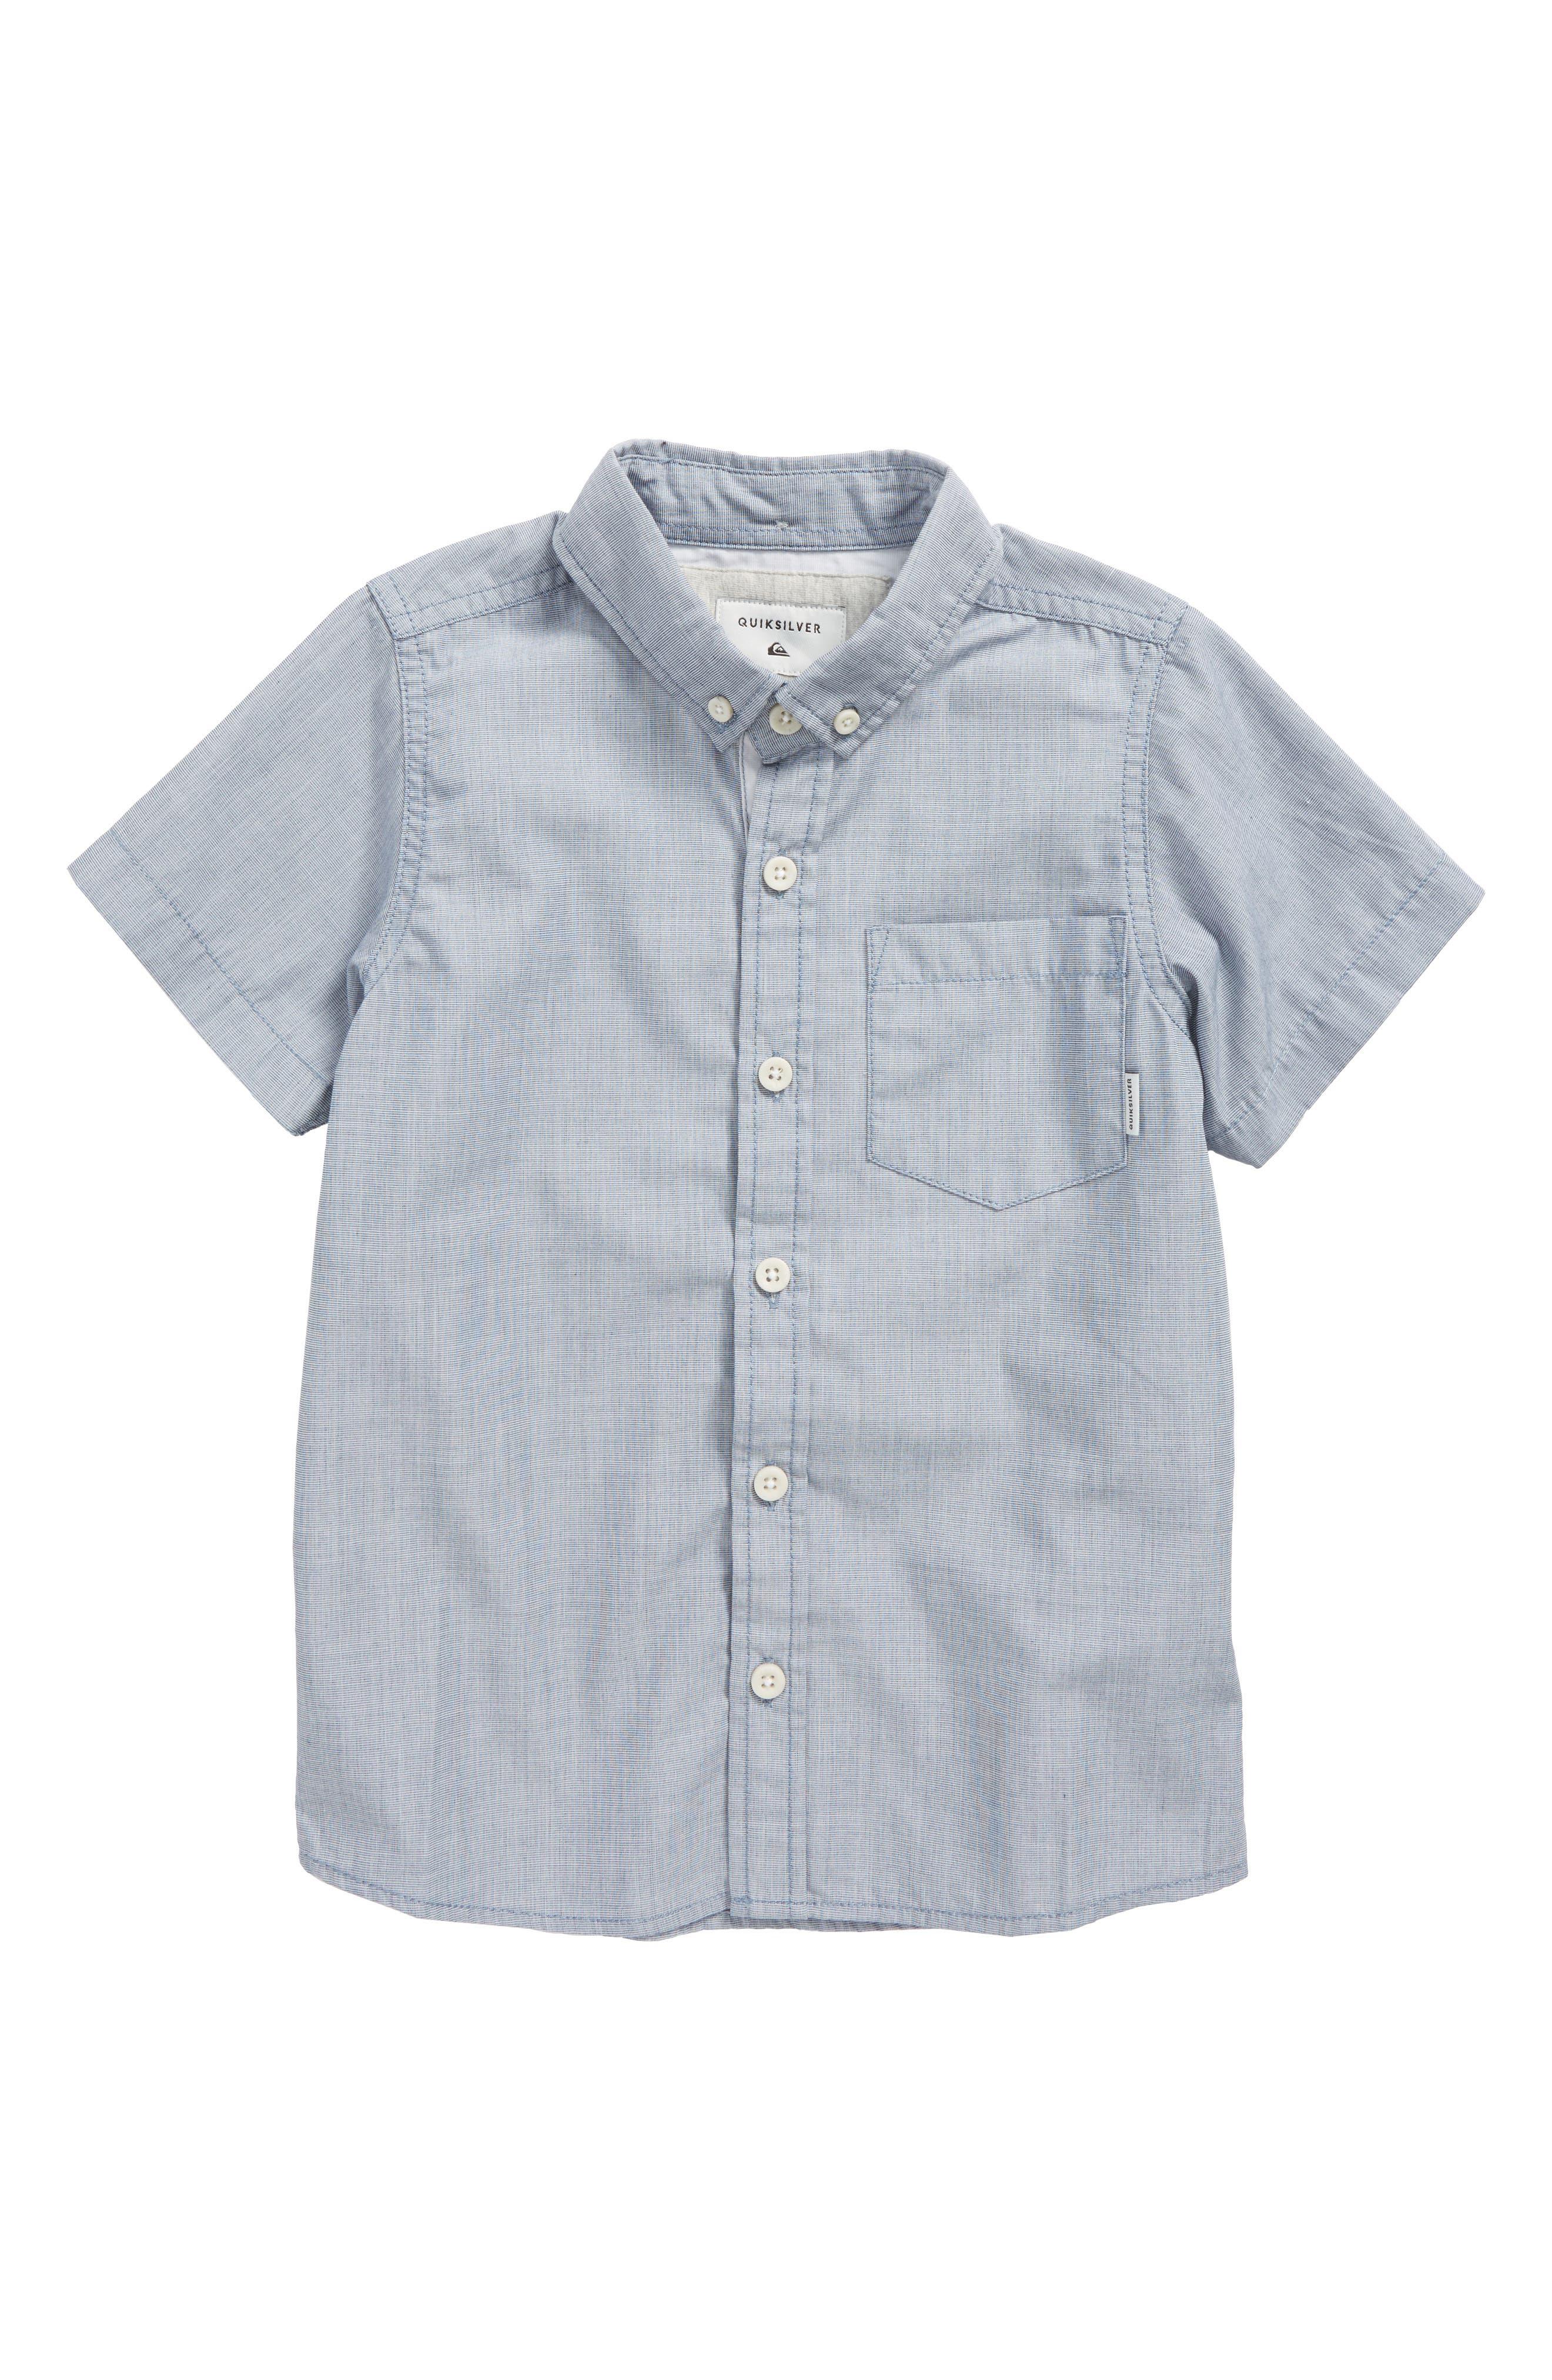 Quiksilver Everyday Wilsden Woven Shirt (Toddler Boys & Little Boys)